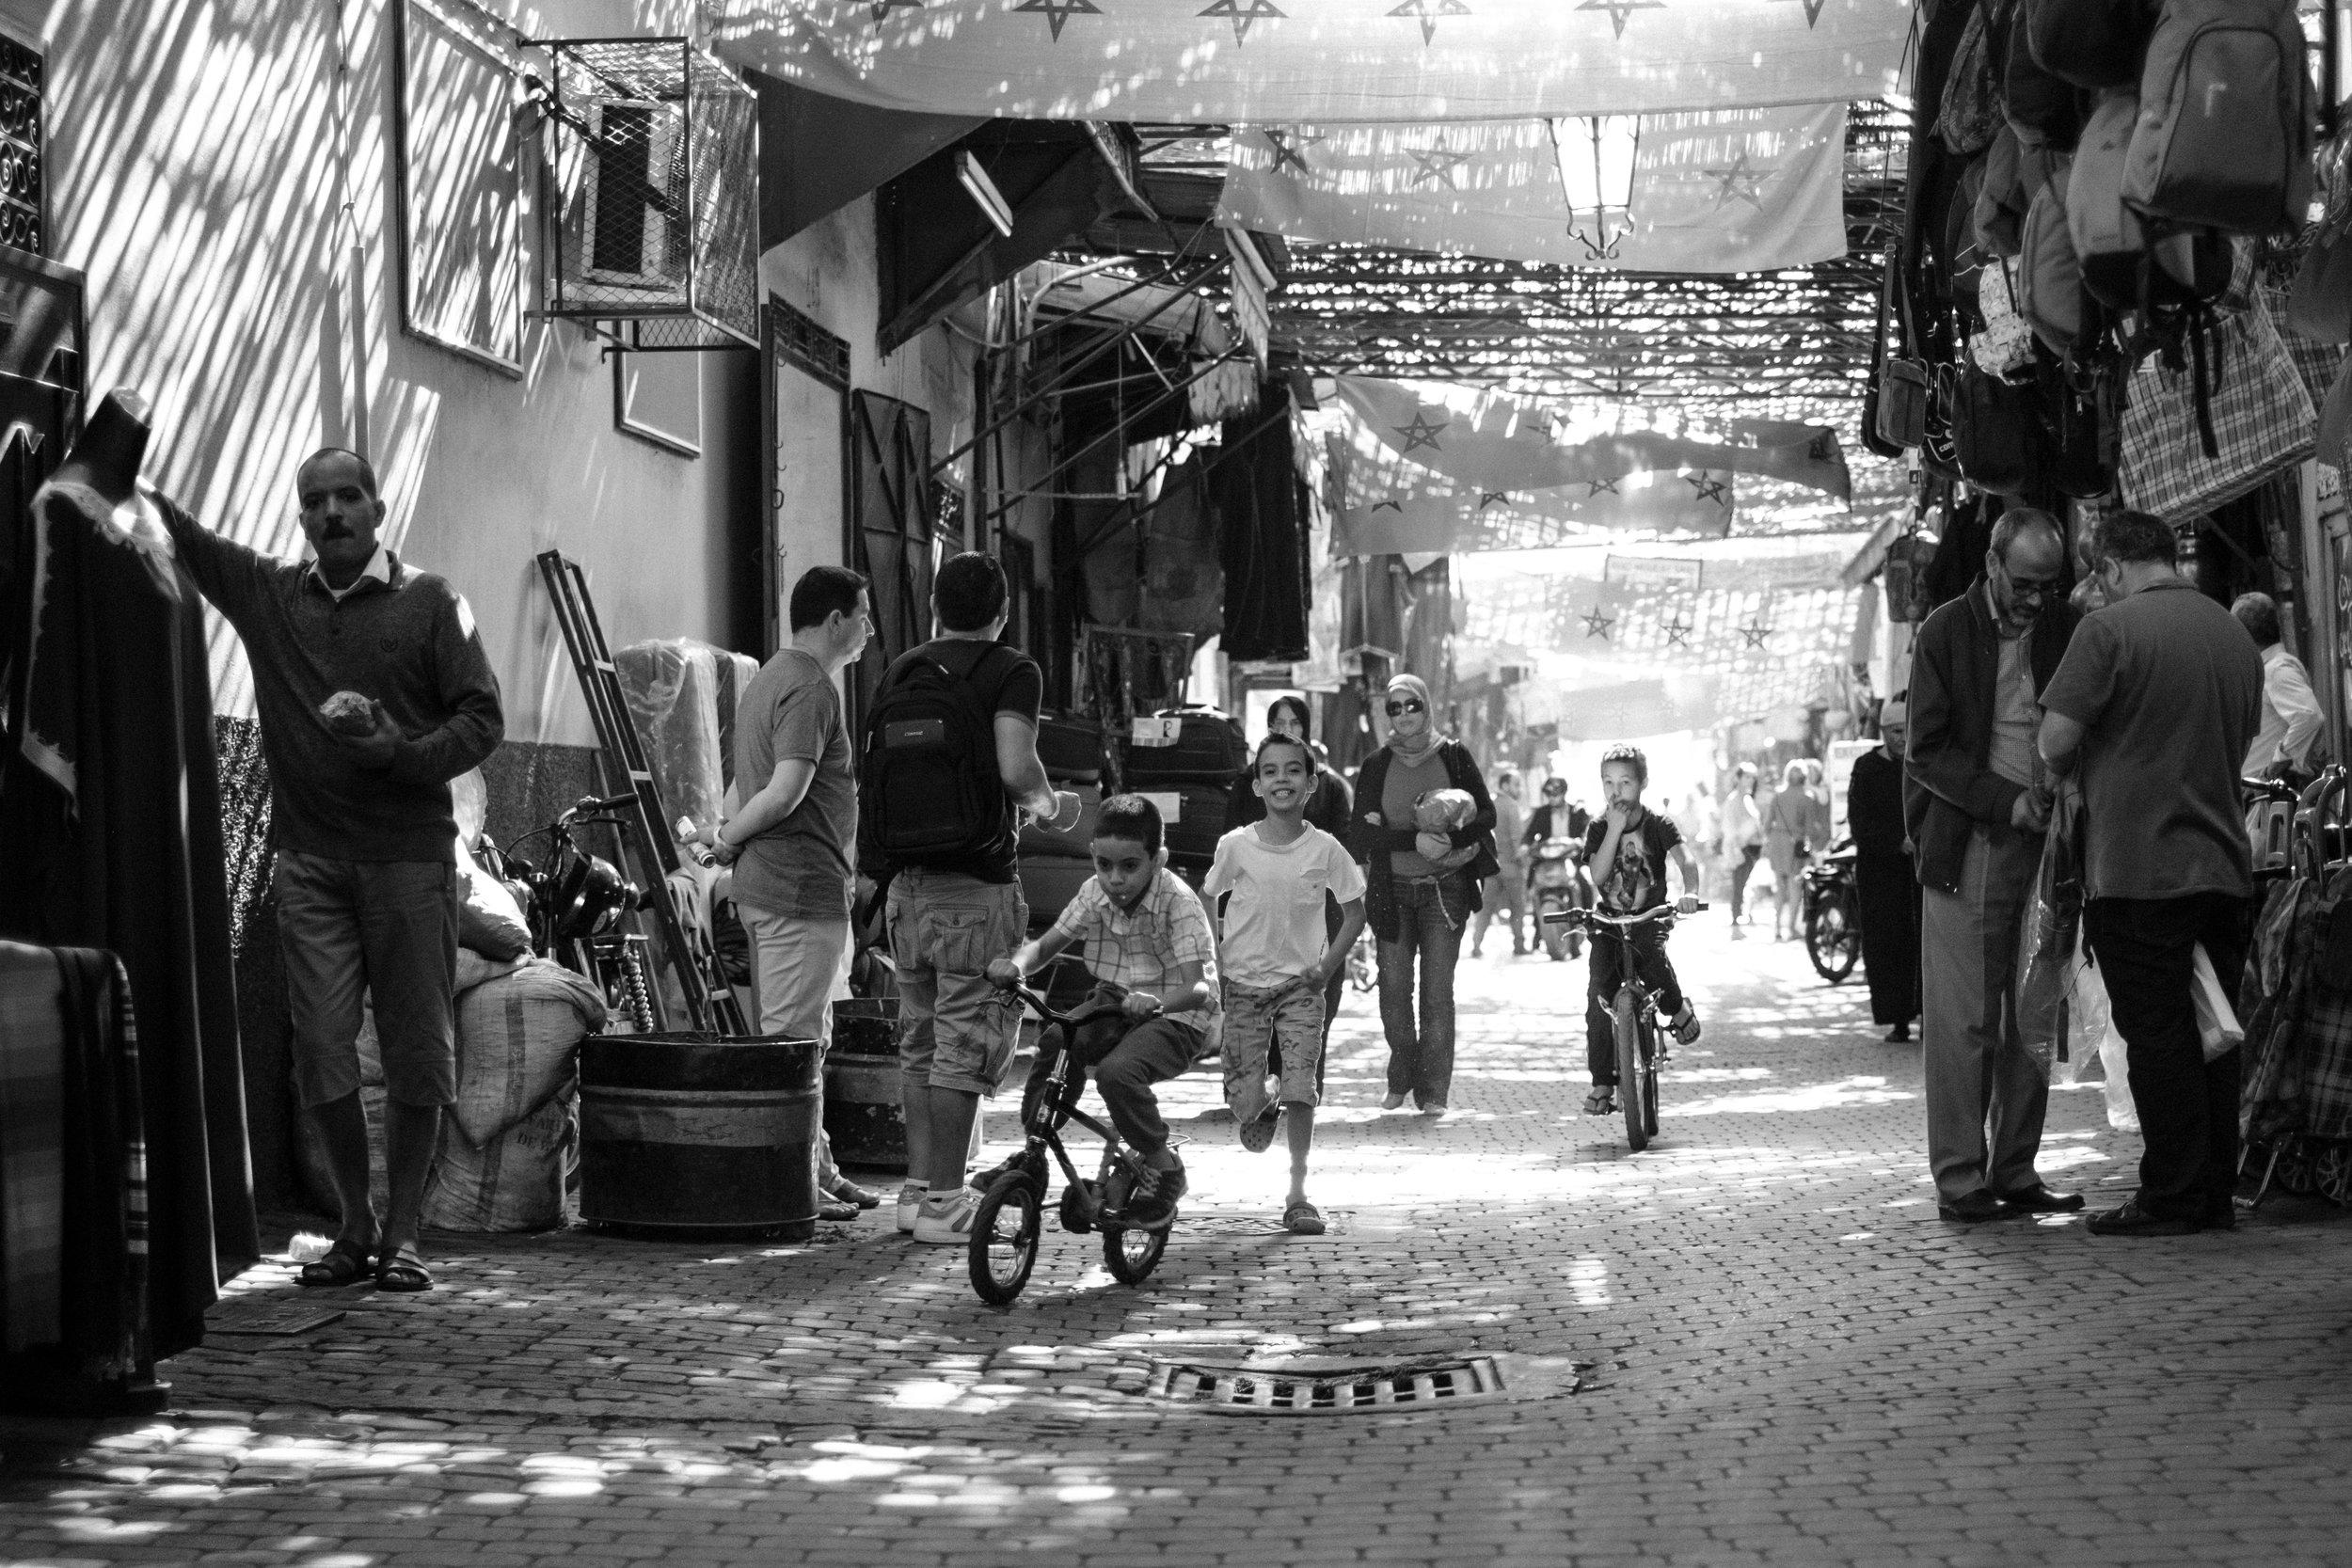 Marrakech,  Morocco , Fujifilm X-Pro2, XF 35mm f/1.4 R @ f/1.4